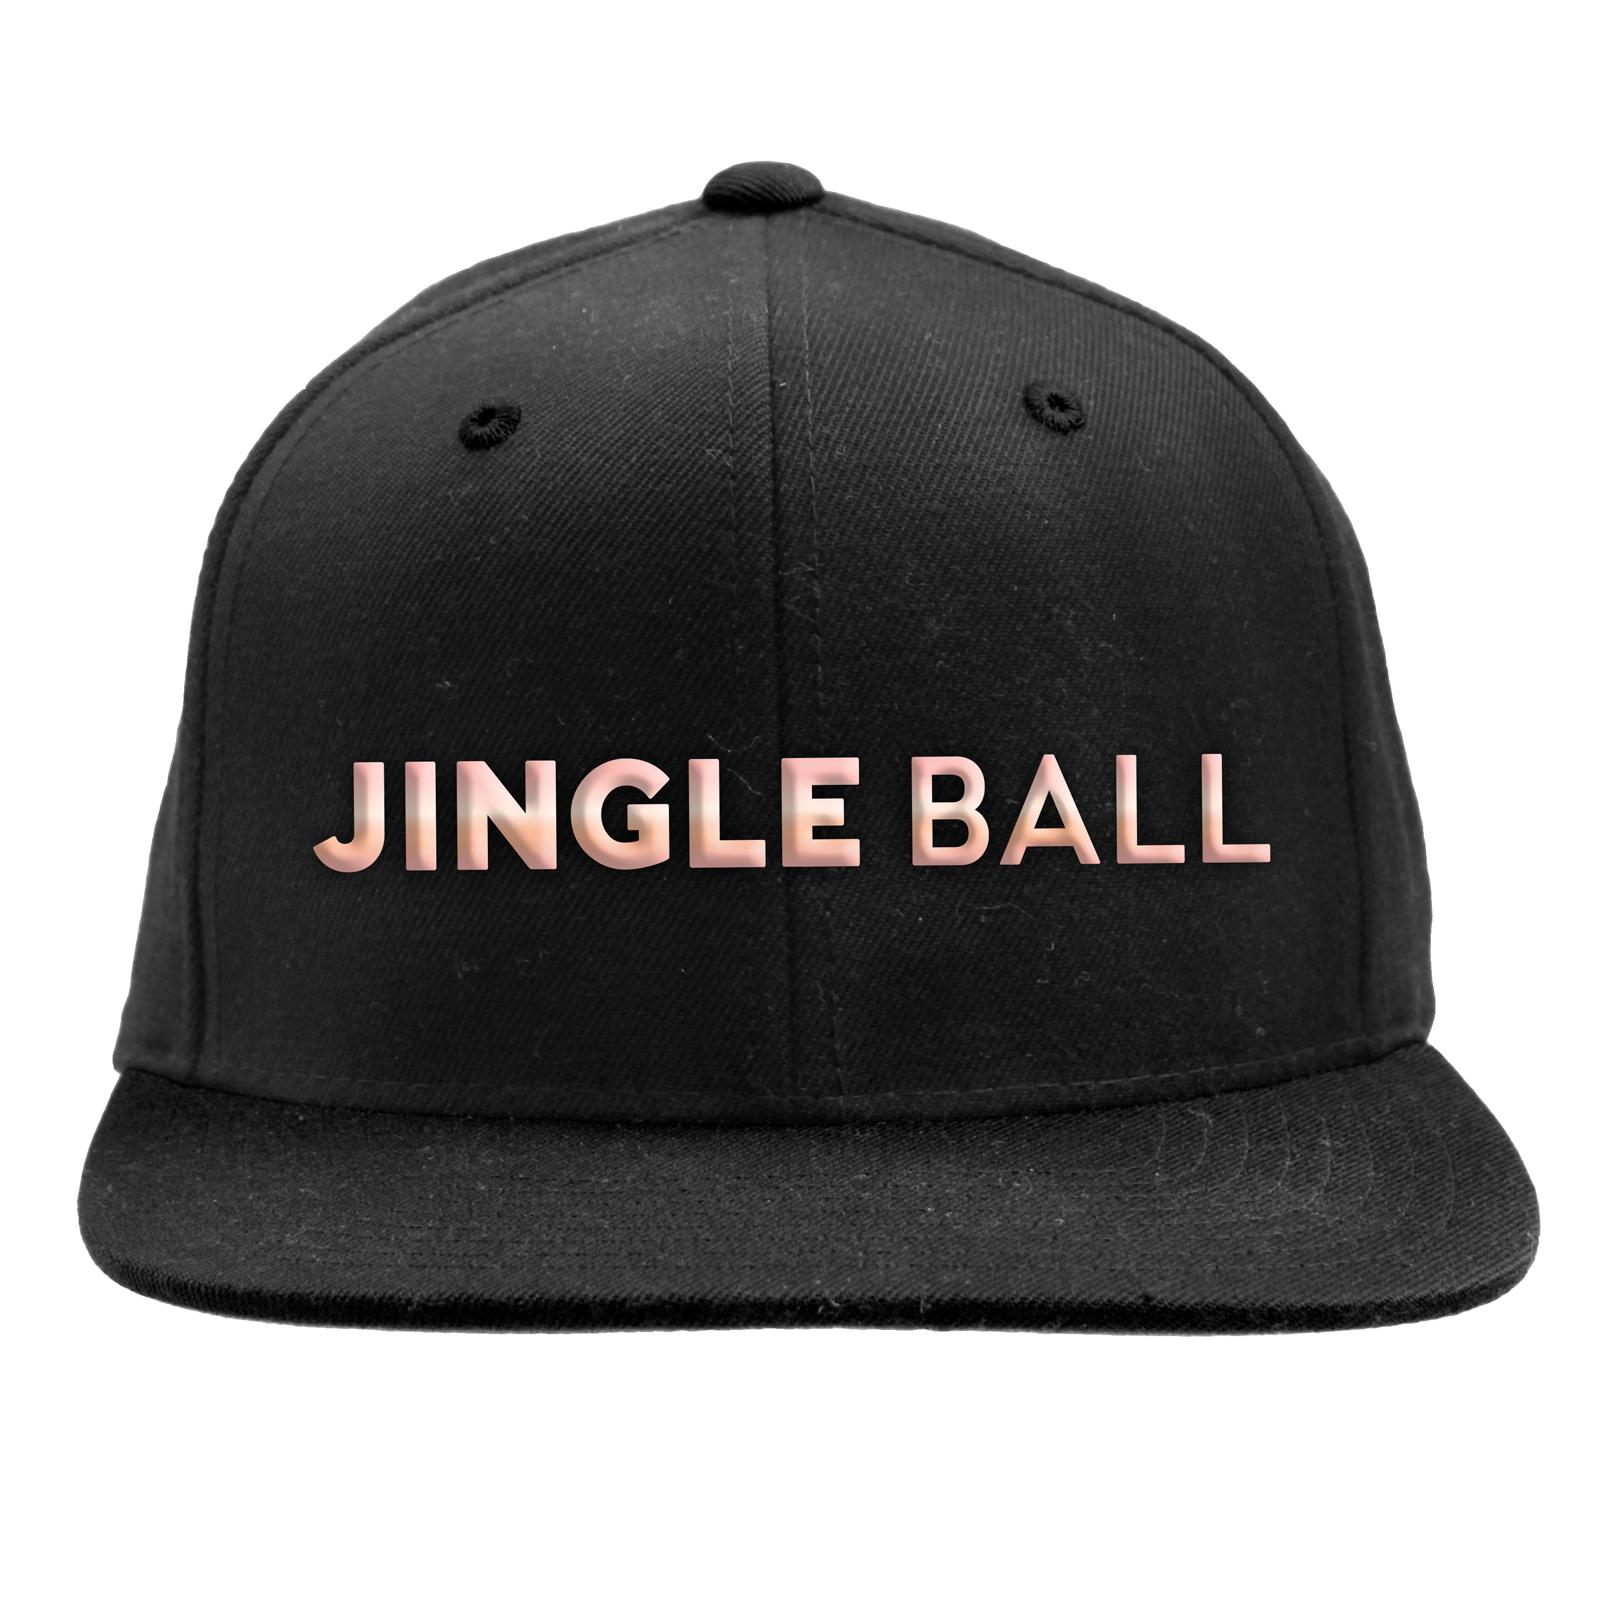 2018 Jingle Ball Tour Hat